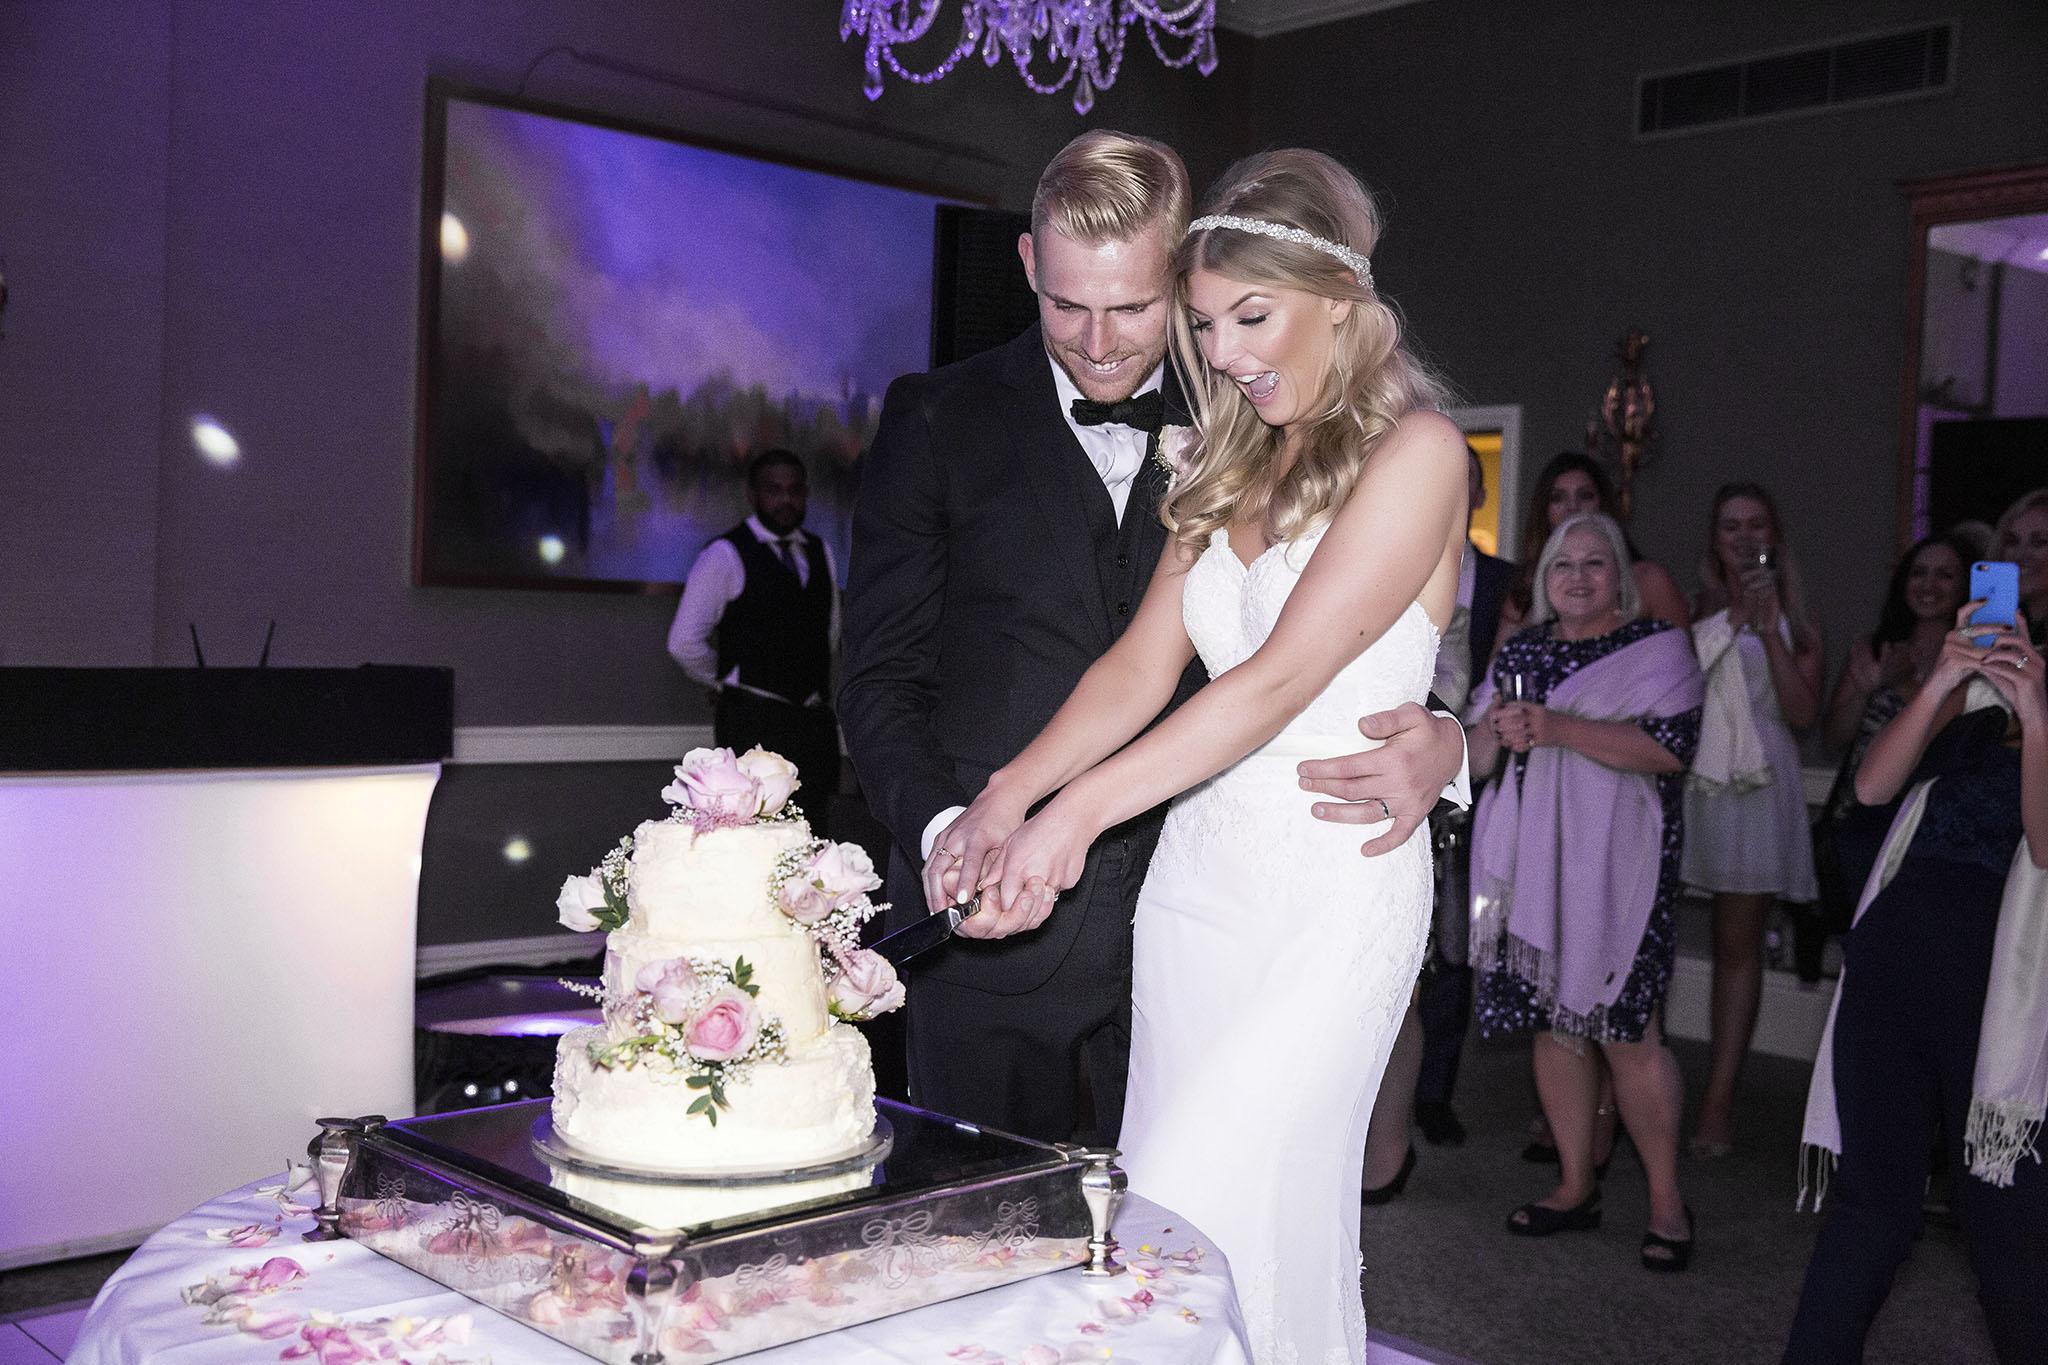 elizabethgphotography_kingslangley_hertfordshire_fineart_wedding_stmichaelsmanor_hotel_stalbans_luciejack_36.jpg